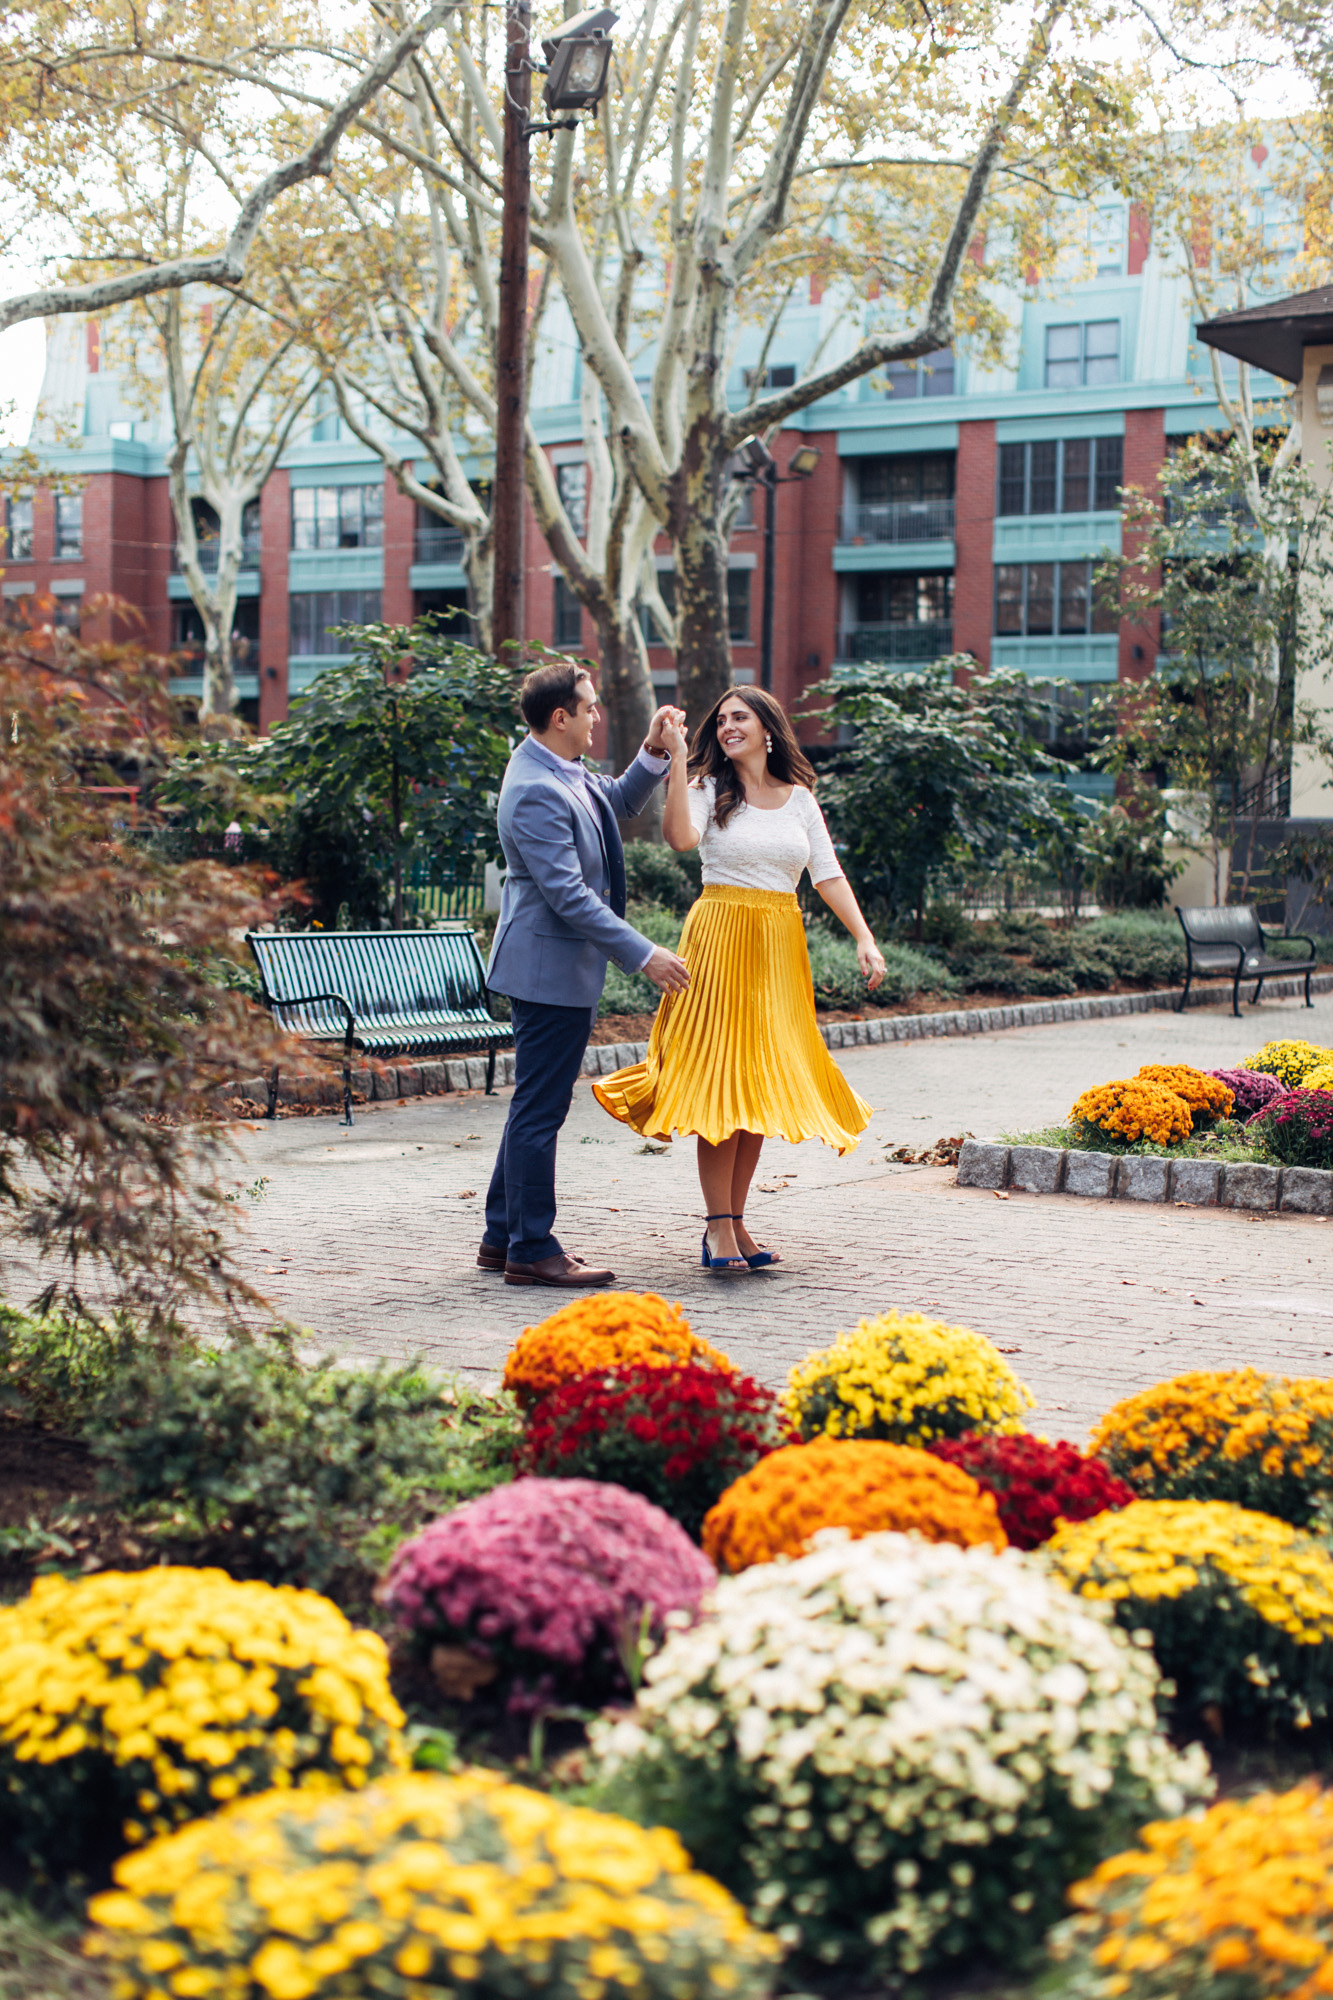 Brooklyn NYC wedding photographer Boris Zaretsky new jersey hoboken engagement5X2A9491 copy.jpg